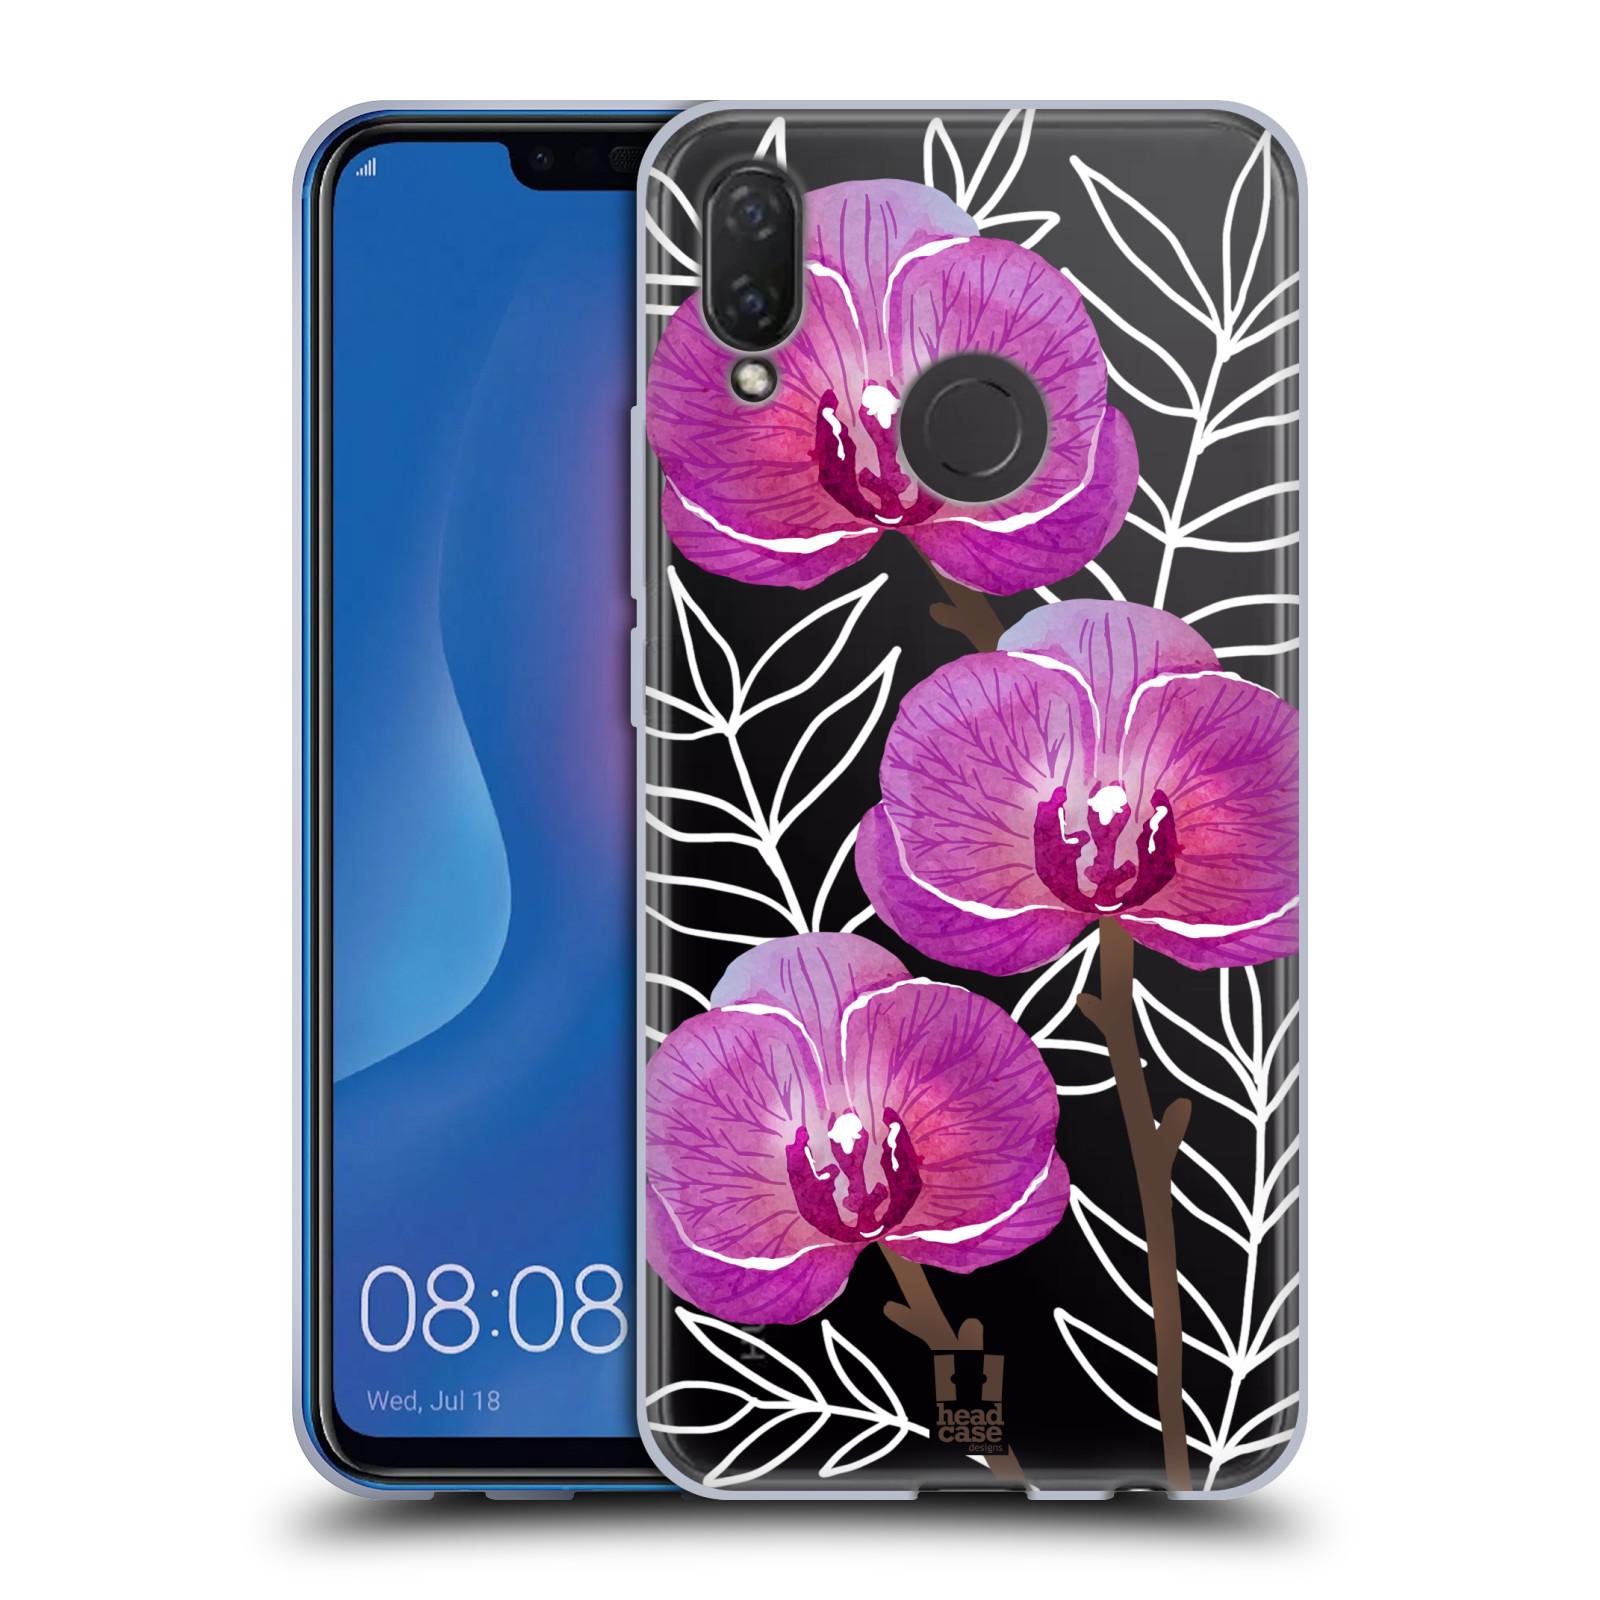 Silikonové pouzdro na mobil Huawei Nova 3i - Head Case - Hezoučké kvítky - průhledné